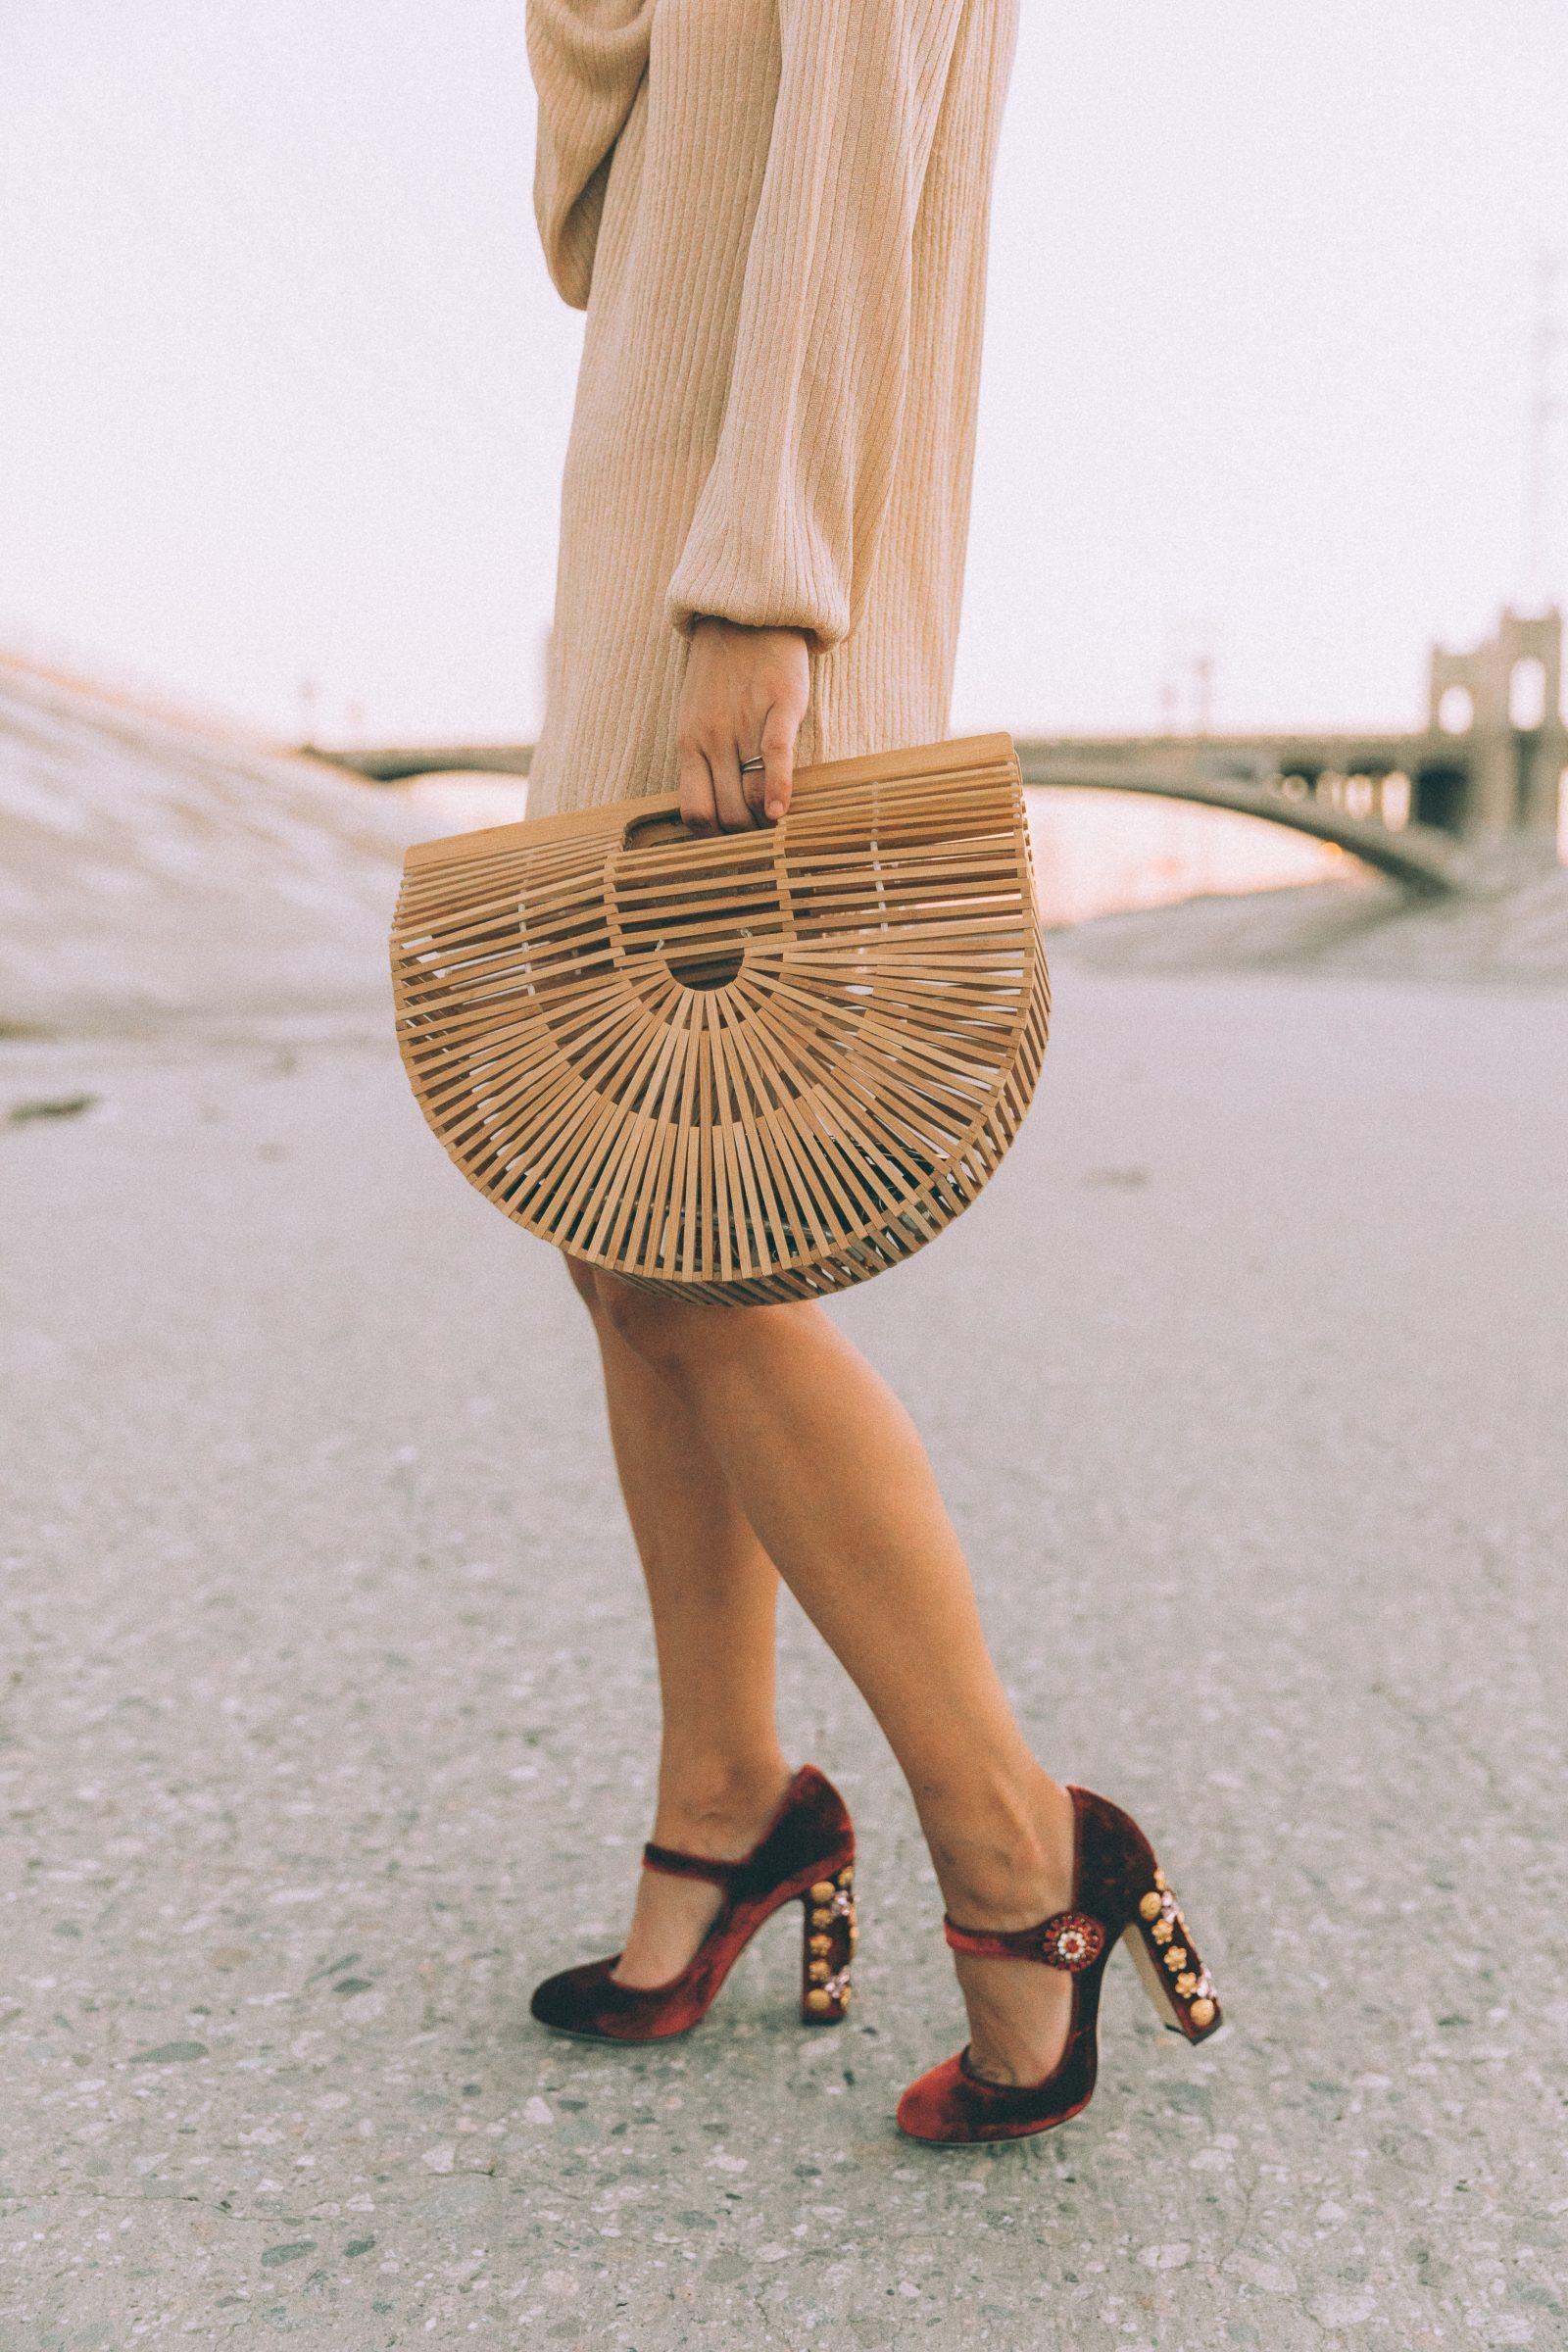 dolce_gabbana_shoes-mytheresa_dgxmytheresa-velvet_shoes-christmas_outfit-golden_little_dress-lpa-topknot-marni_maxi_earrings-cult_gaia-street_style-146